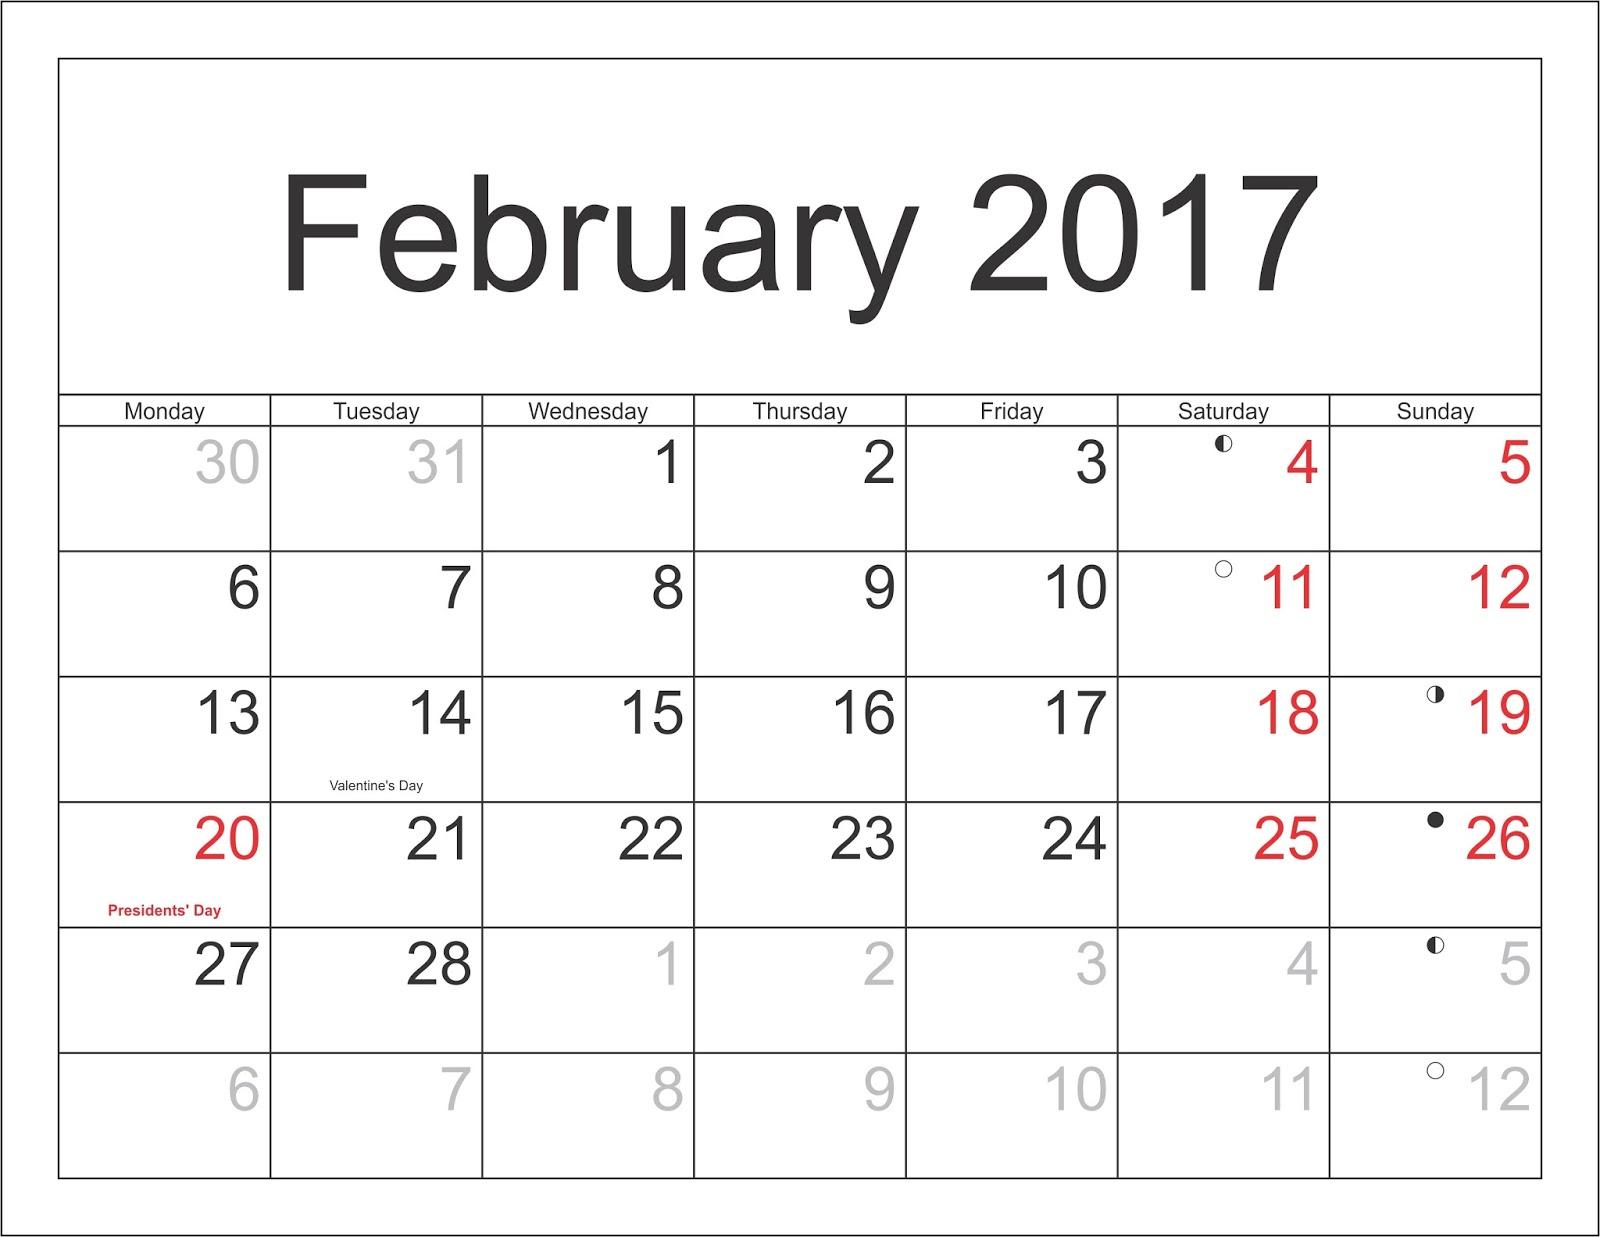 February 2017 Monthly Calendar Printable Templates - Printable ...